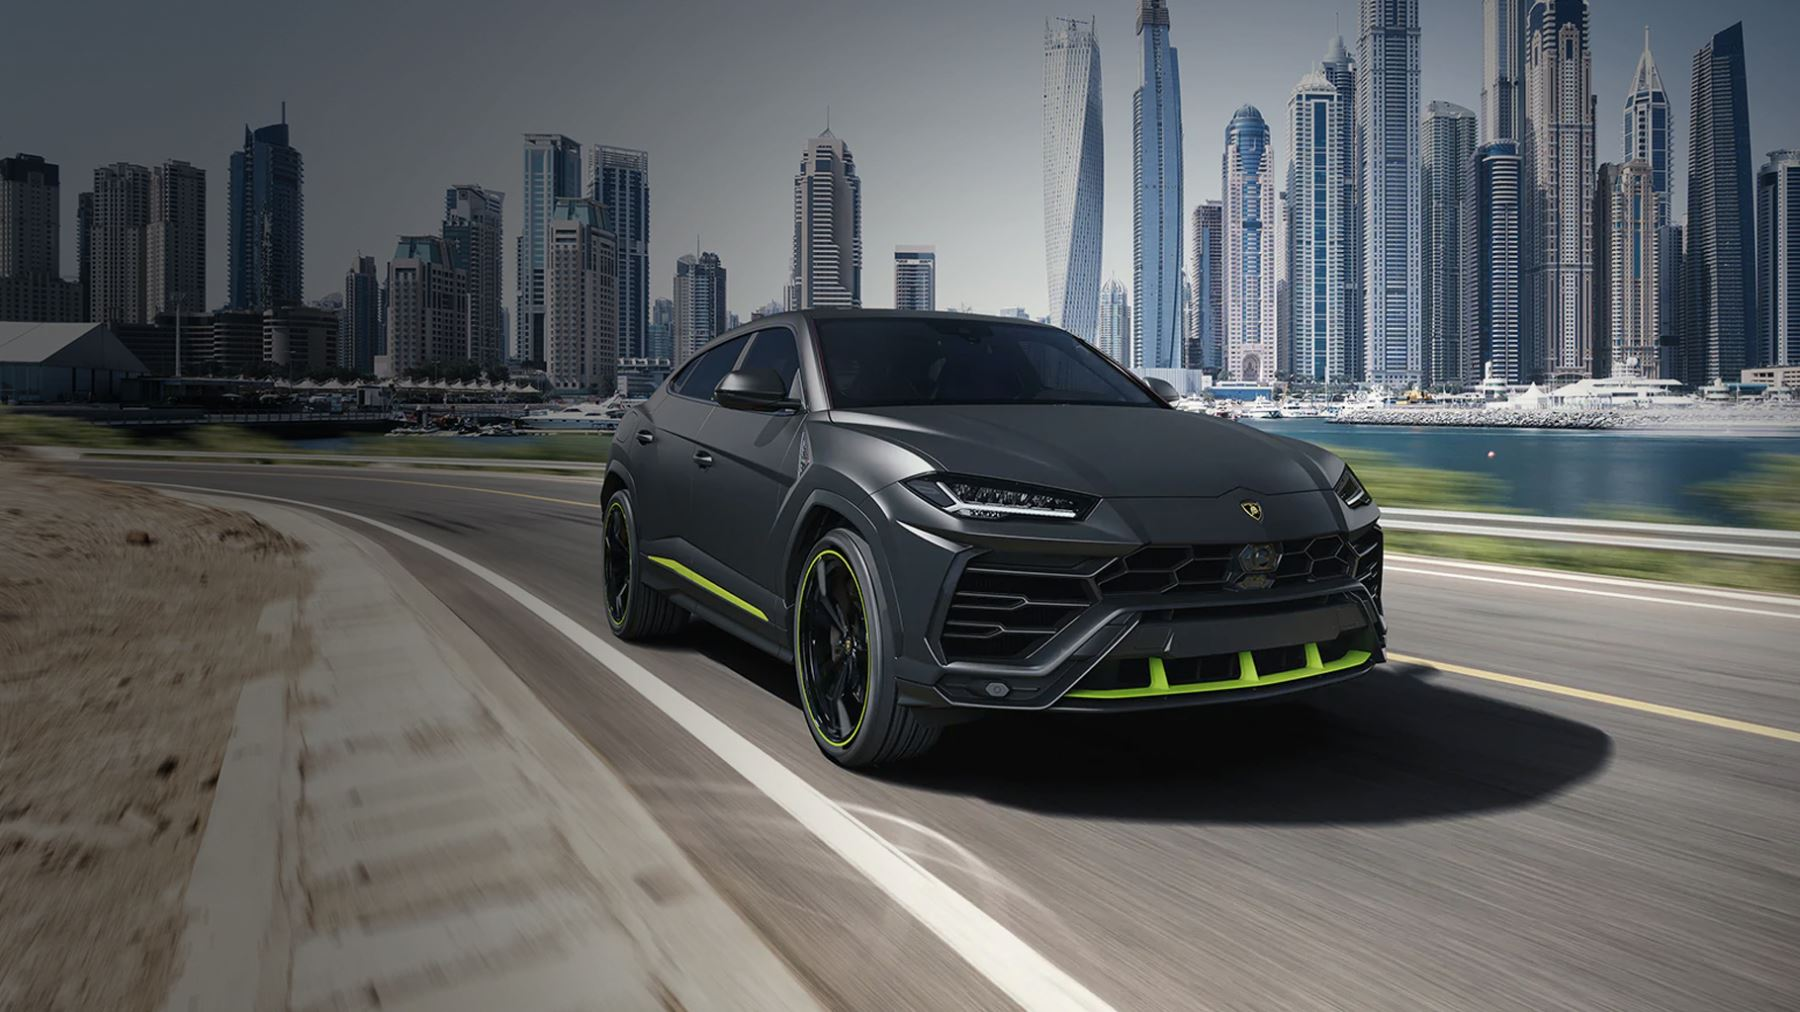 Lamborghini Urus Graphite Capsule - Unlock any road